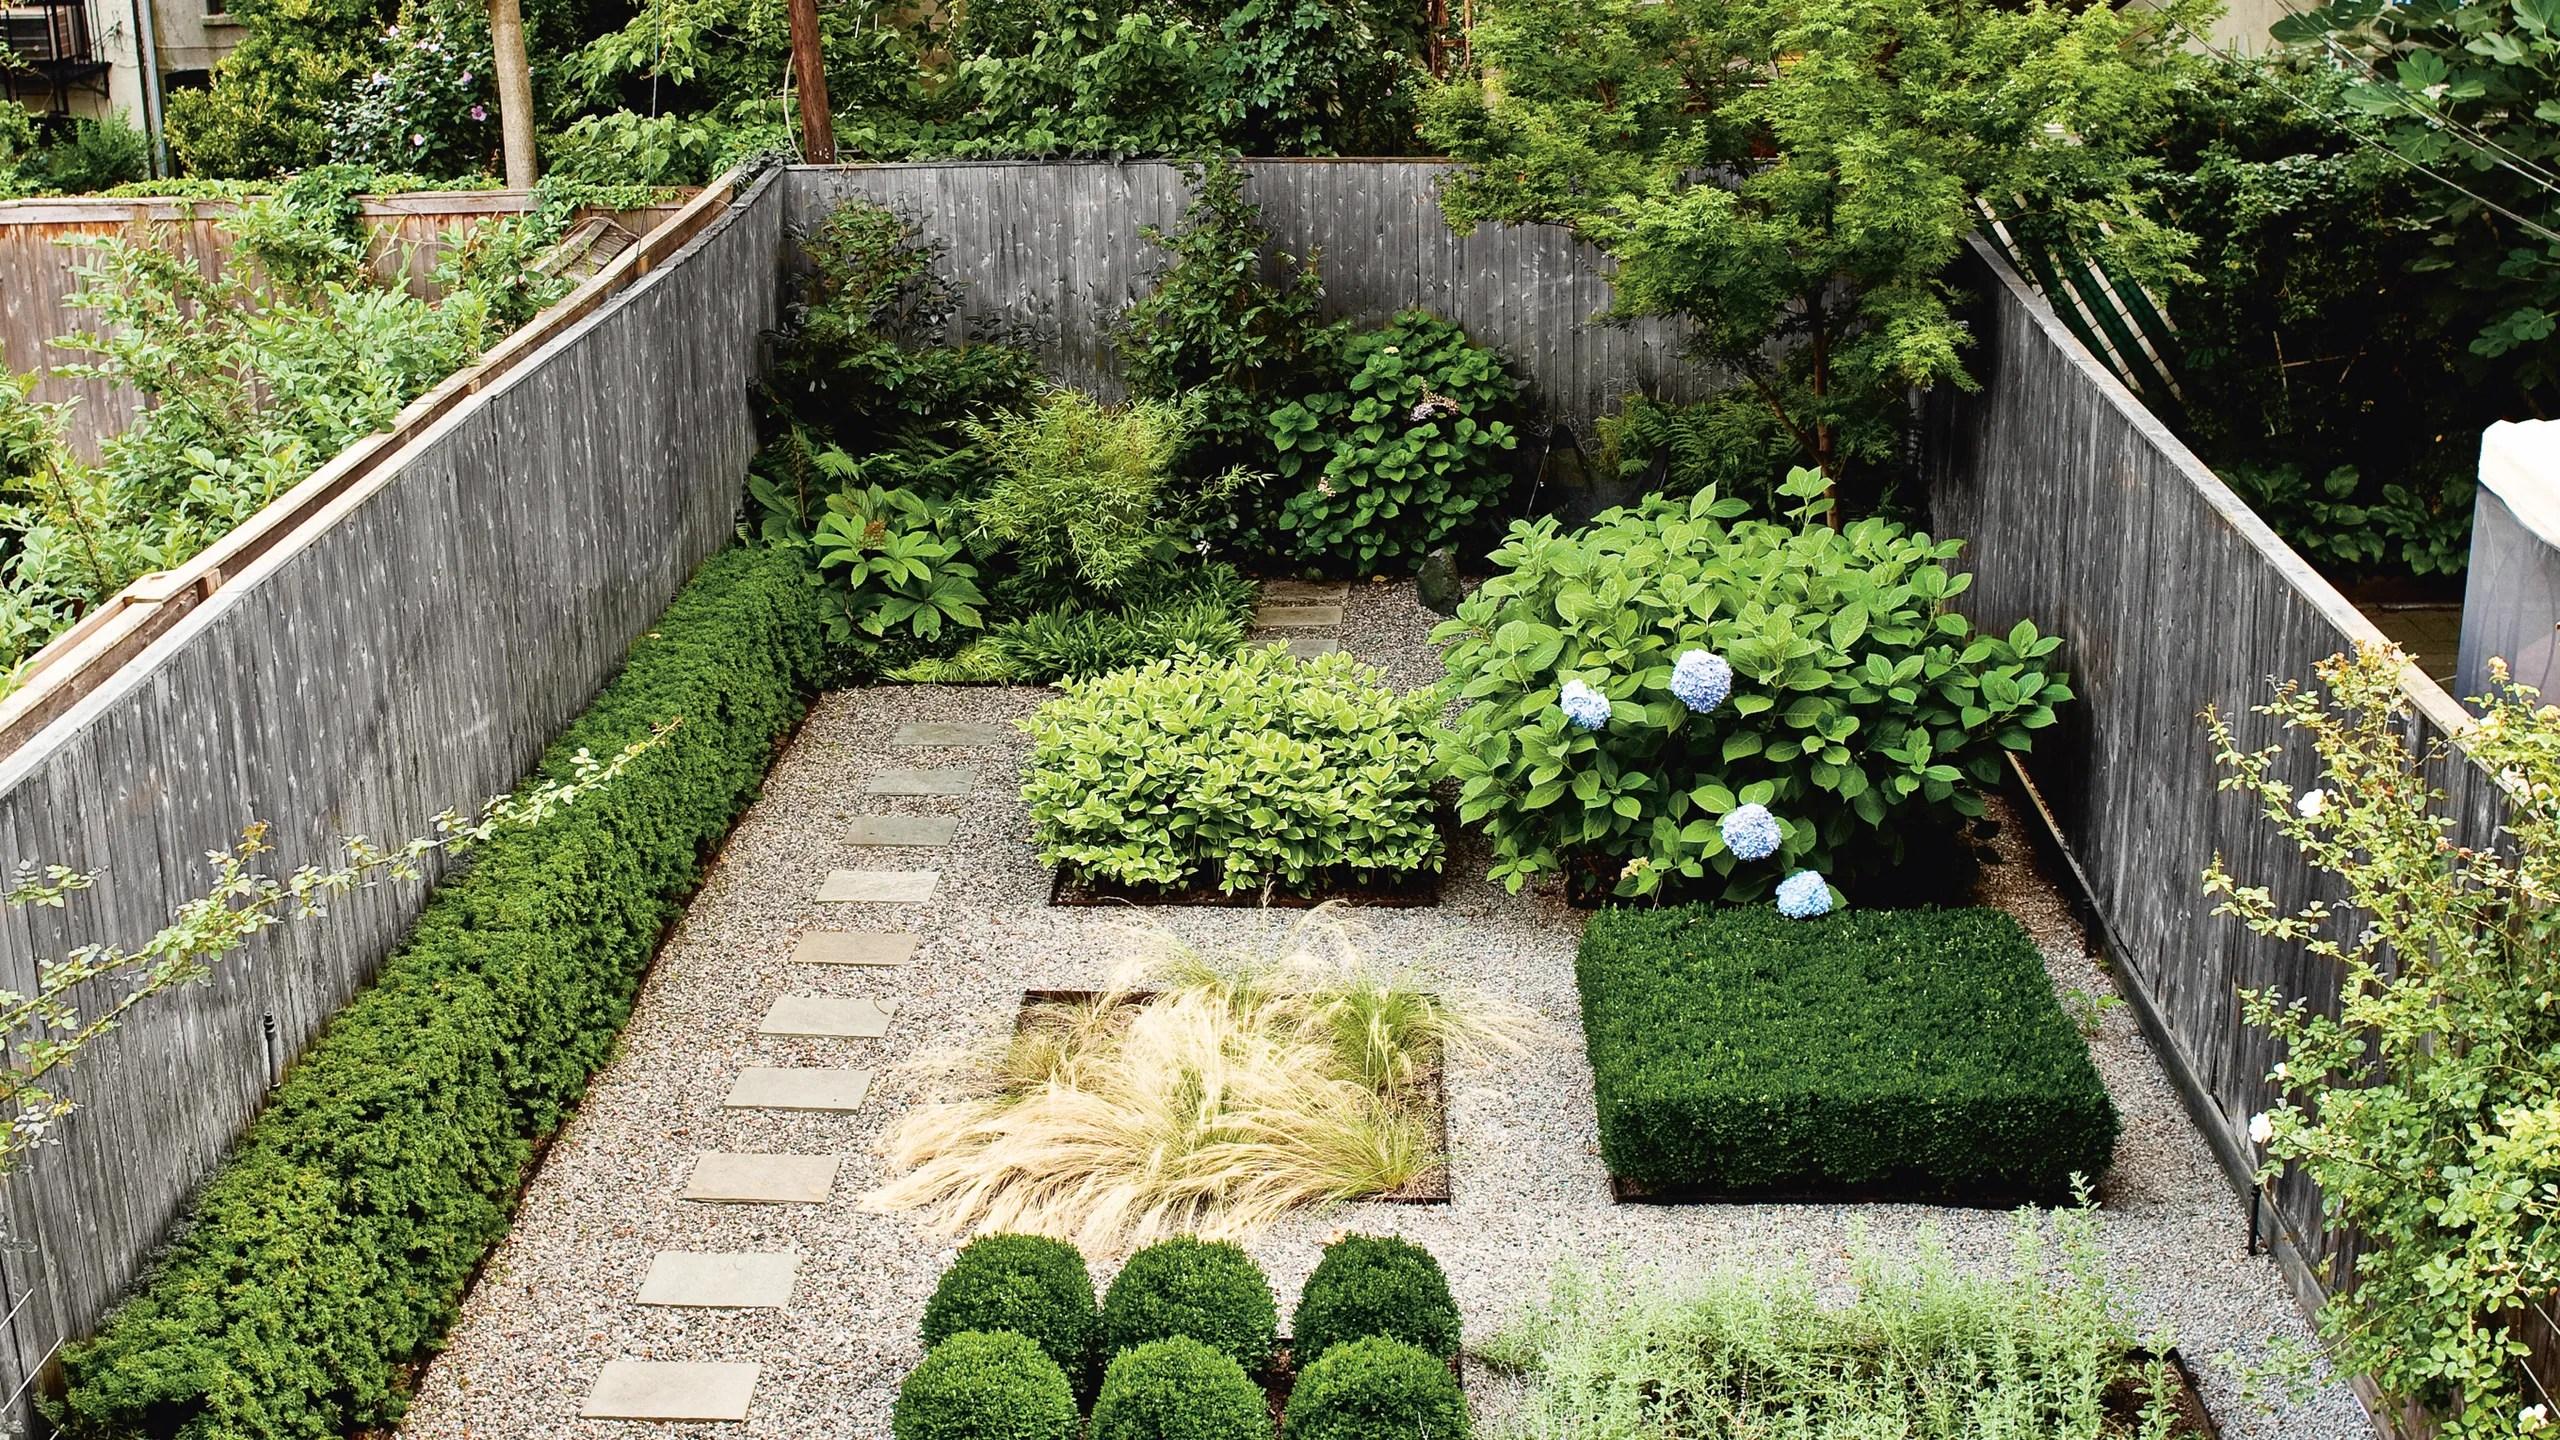 Garden Ideas Inspired By This Brooklyn Backyard ... on Backyard Retreat Ideas id=38358